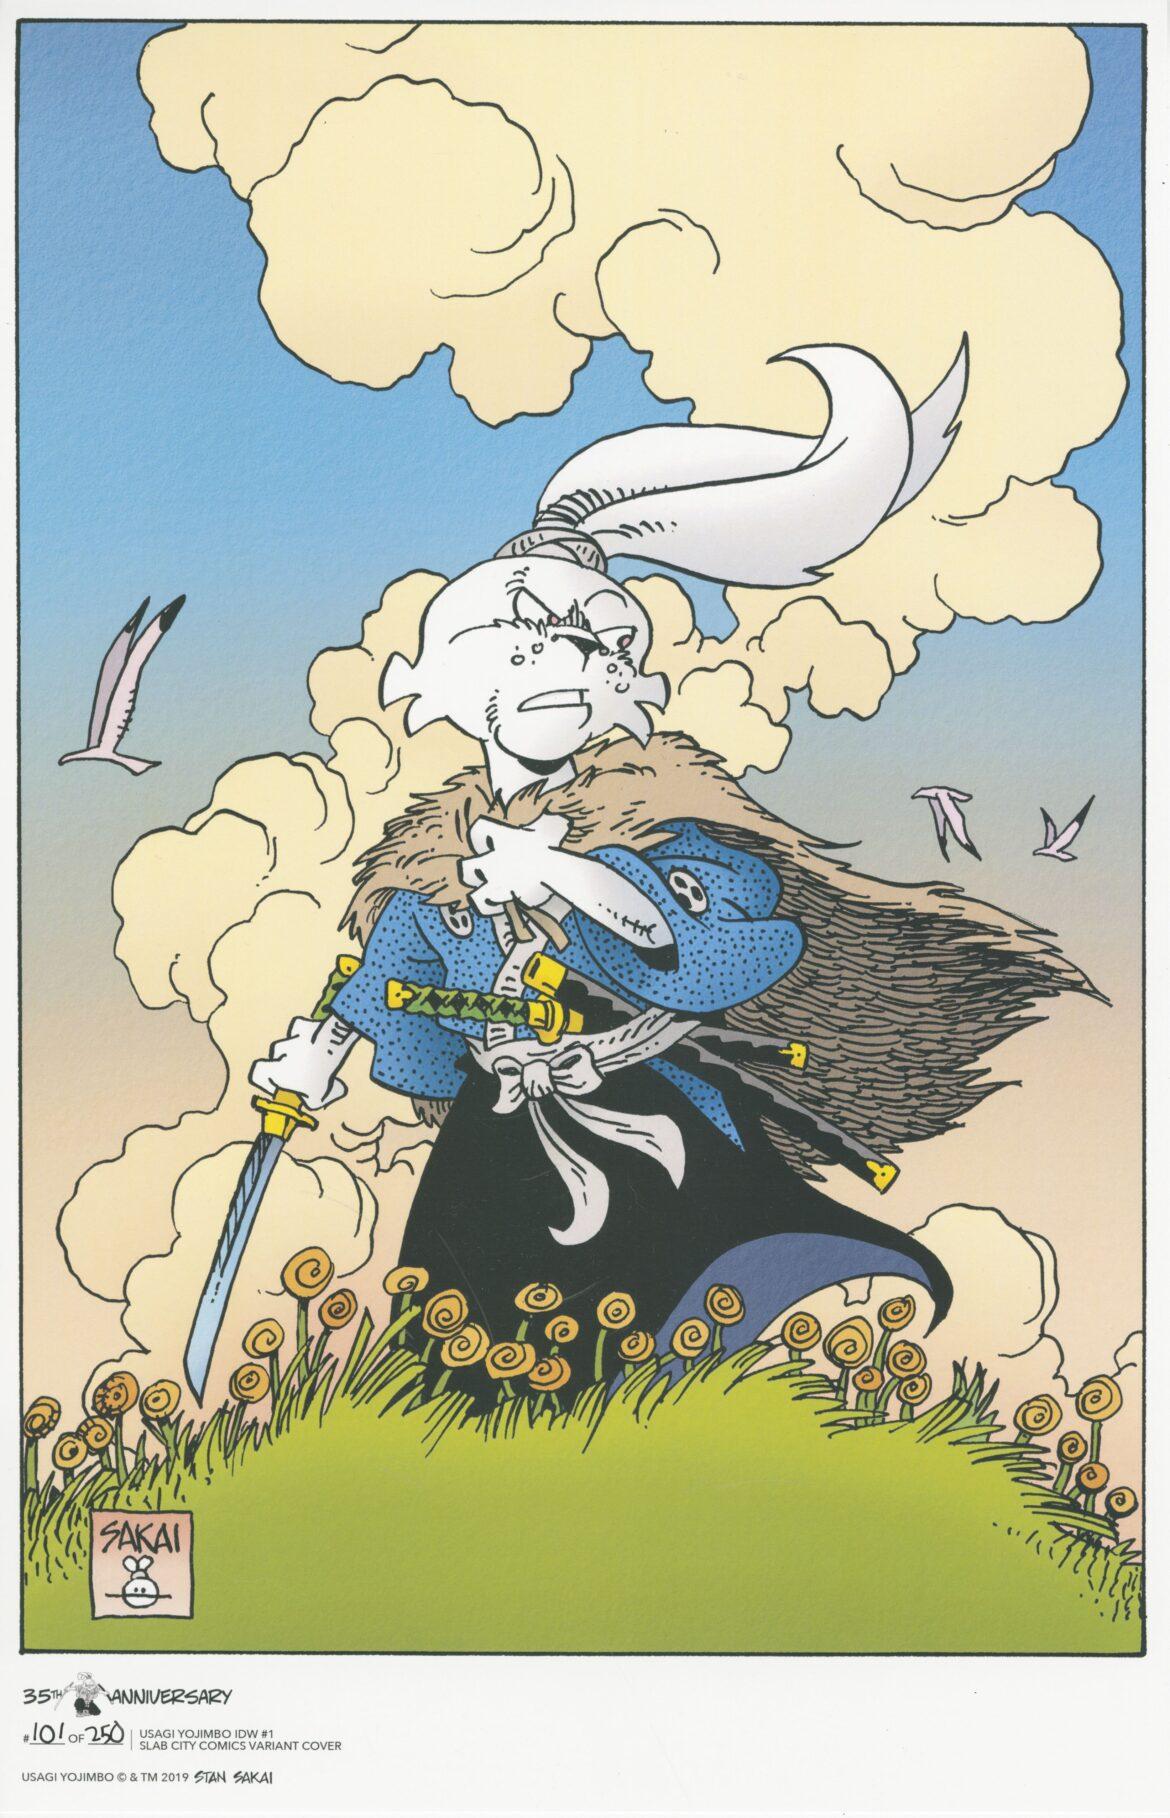 Netflix New Animated Series-  Samurai Rabbit: The Usagi Chronicles